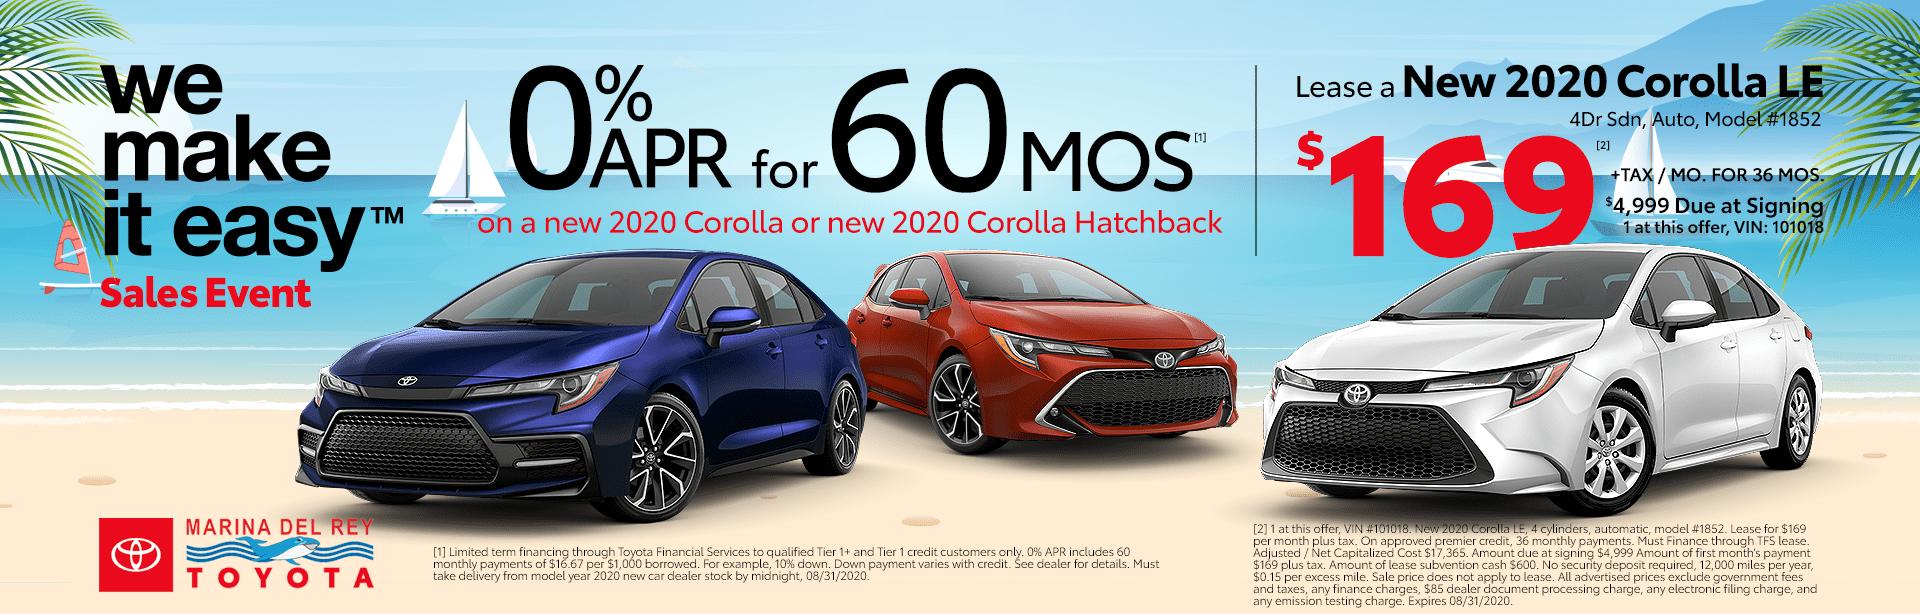 2020 Corolla Lease 2020 Corolla Deals